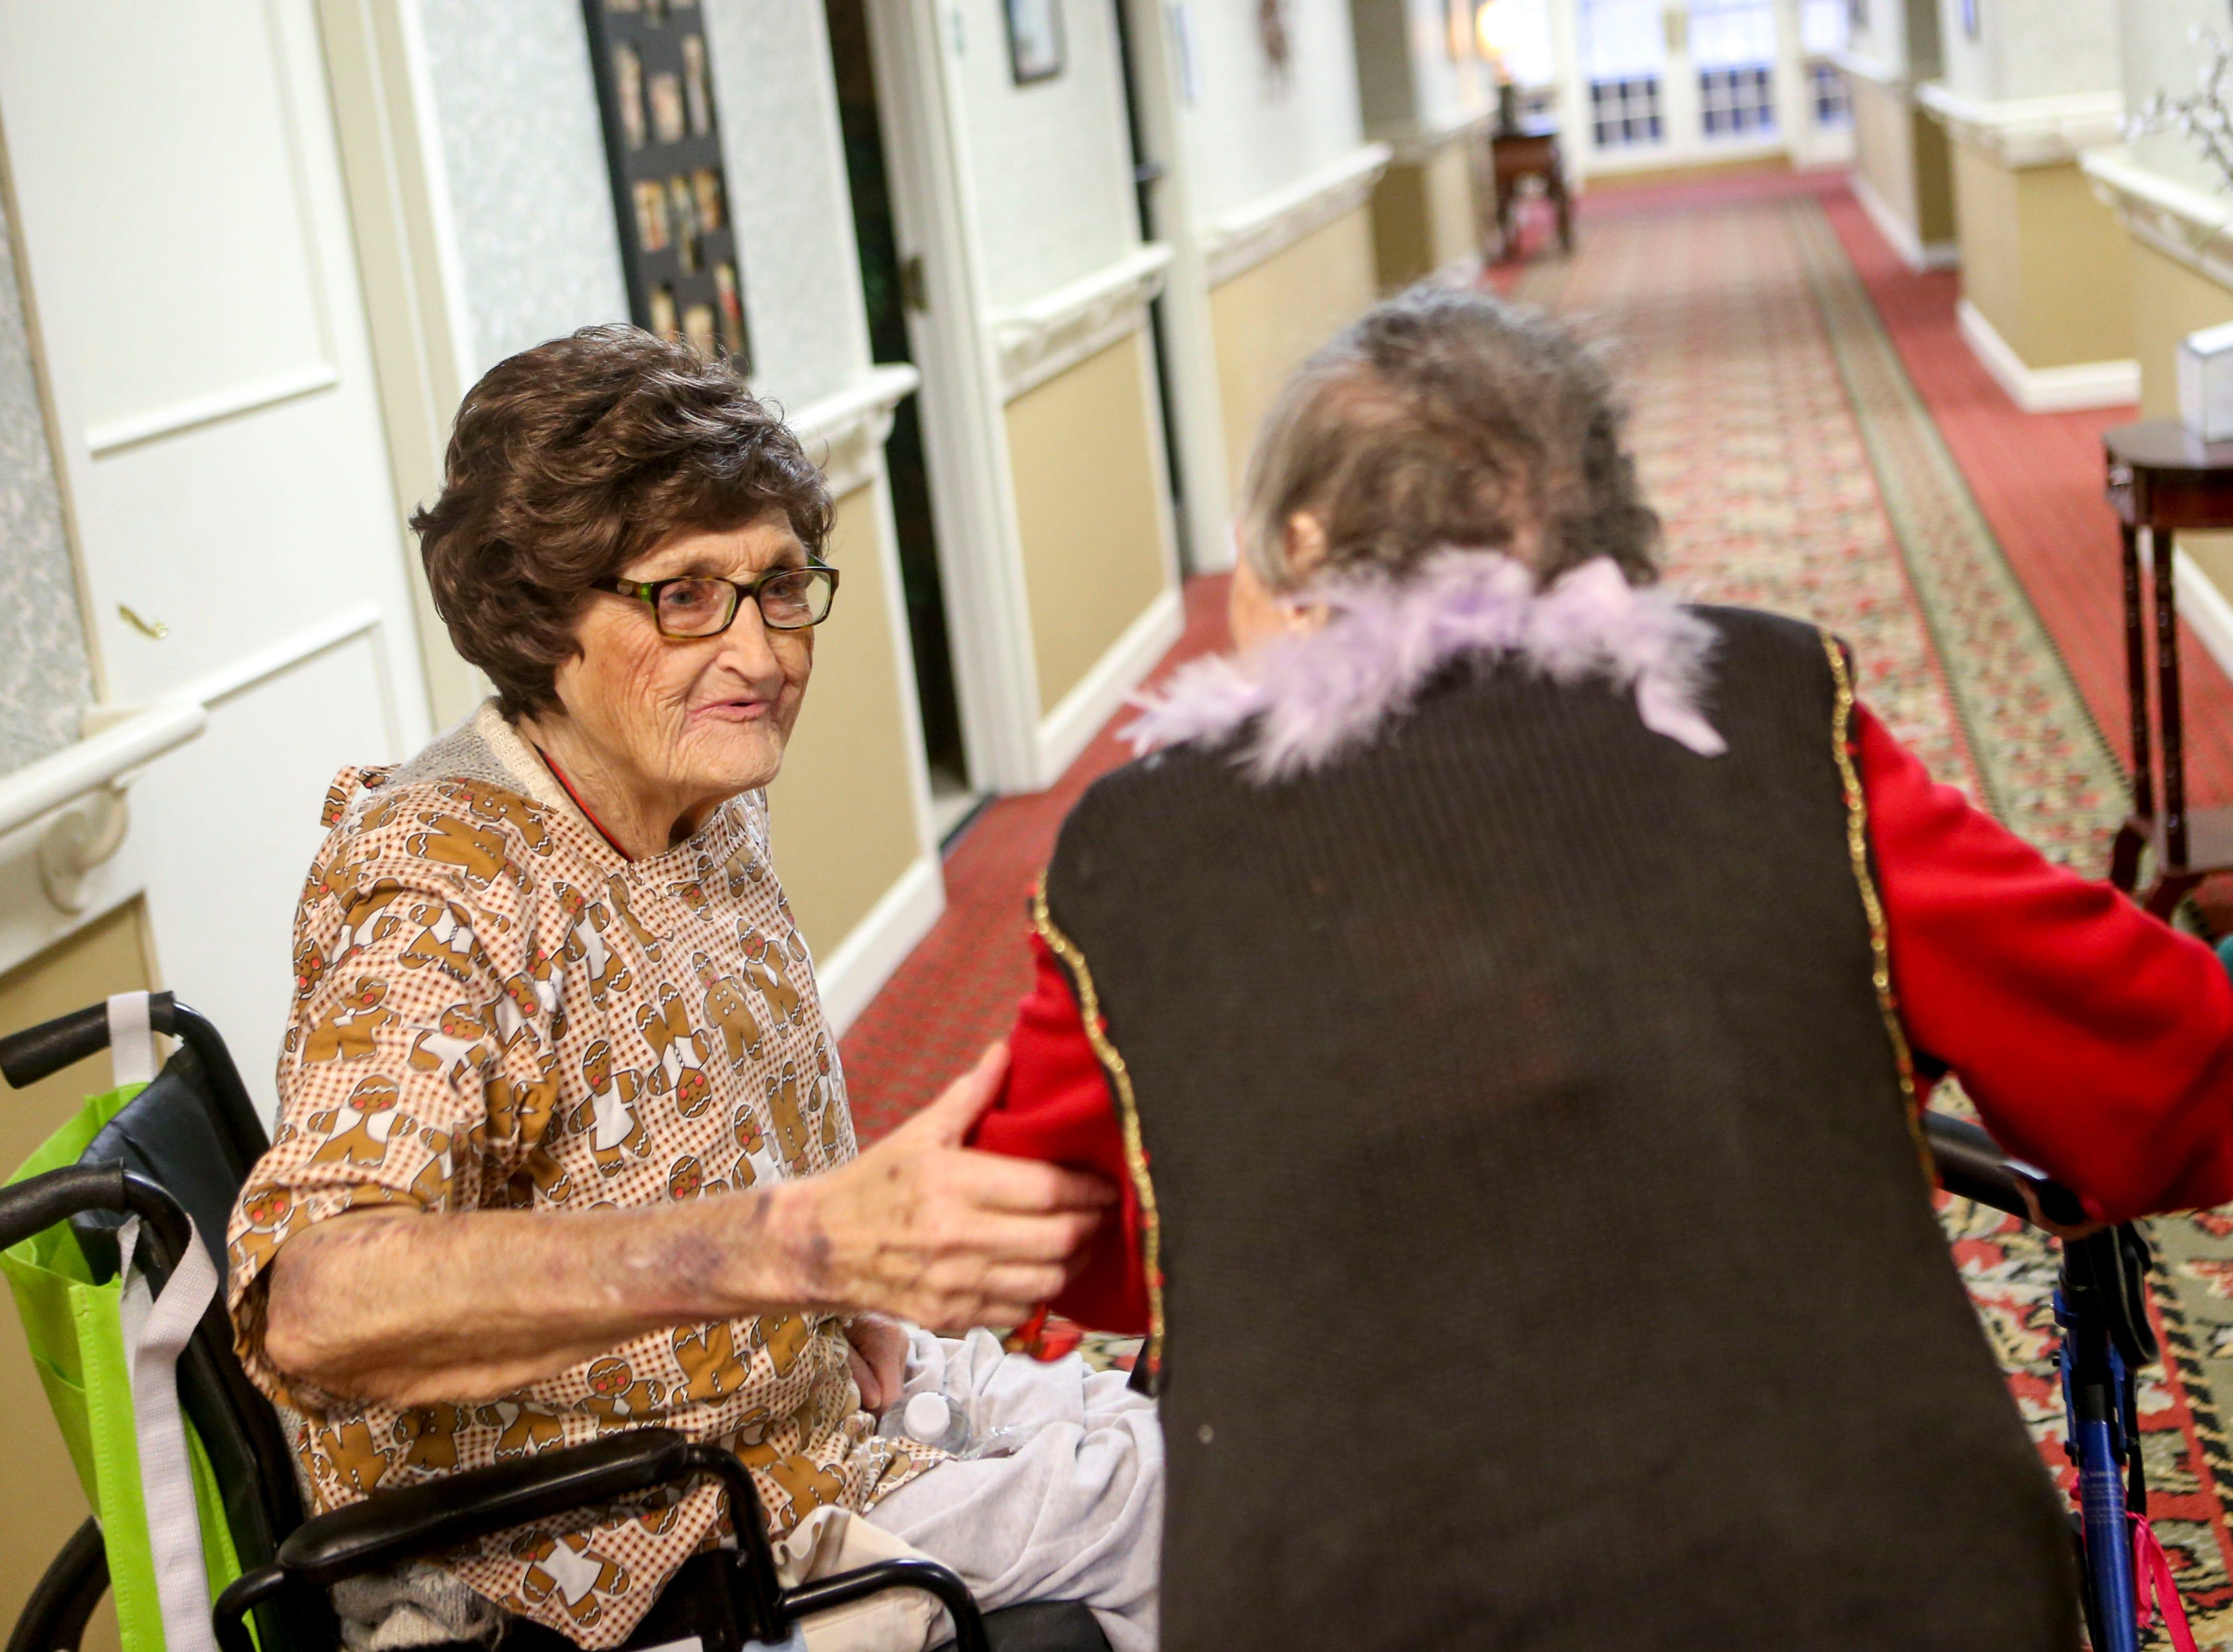 Another resident says happy birthday to Ida Feldman on her 100th birthday at Regency Retirement Home in Jackson, Tenn., on Thursday, Dec. 20, 2018.